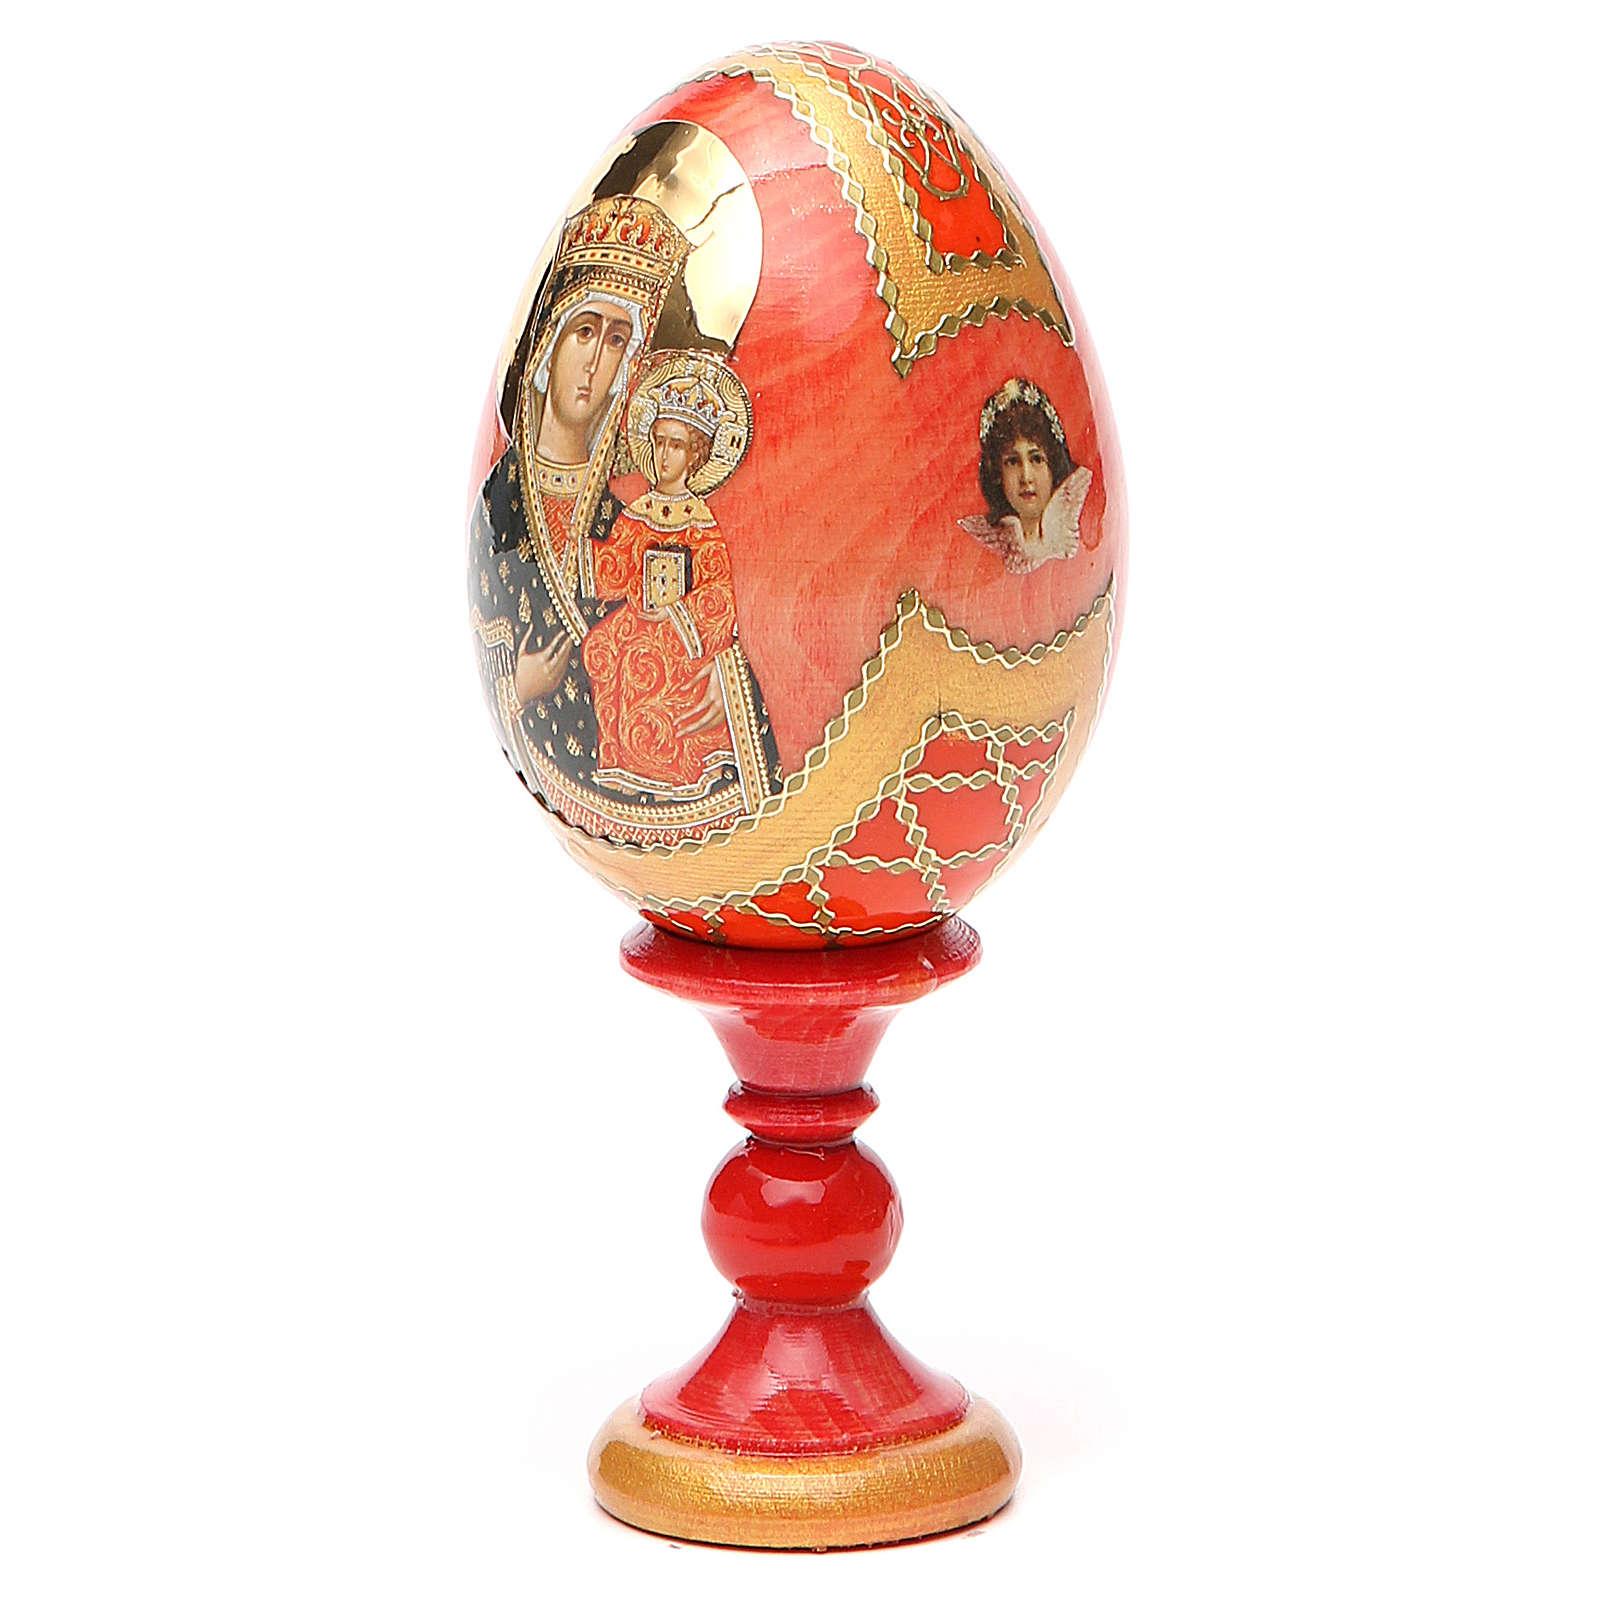 Russian Egg Chenstohovskaya Fabergè style 13cm 4